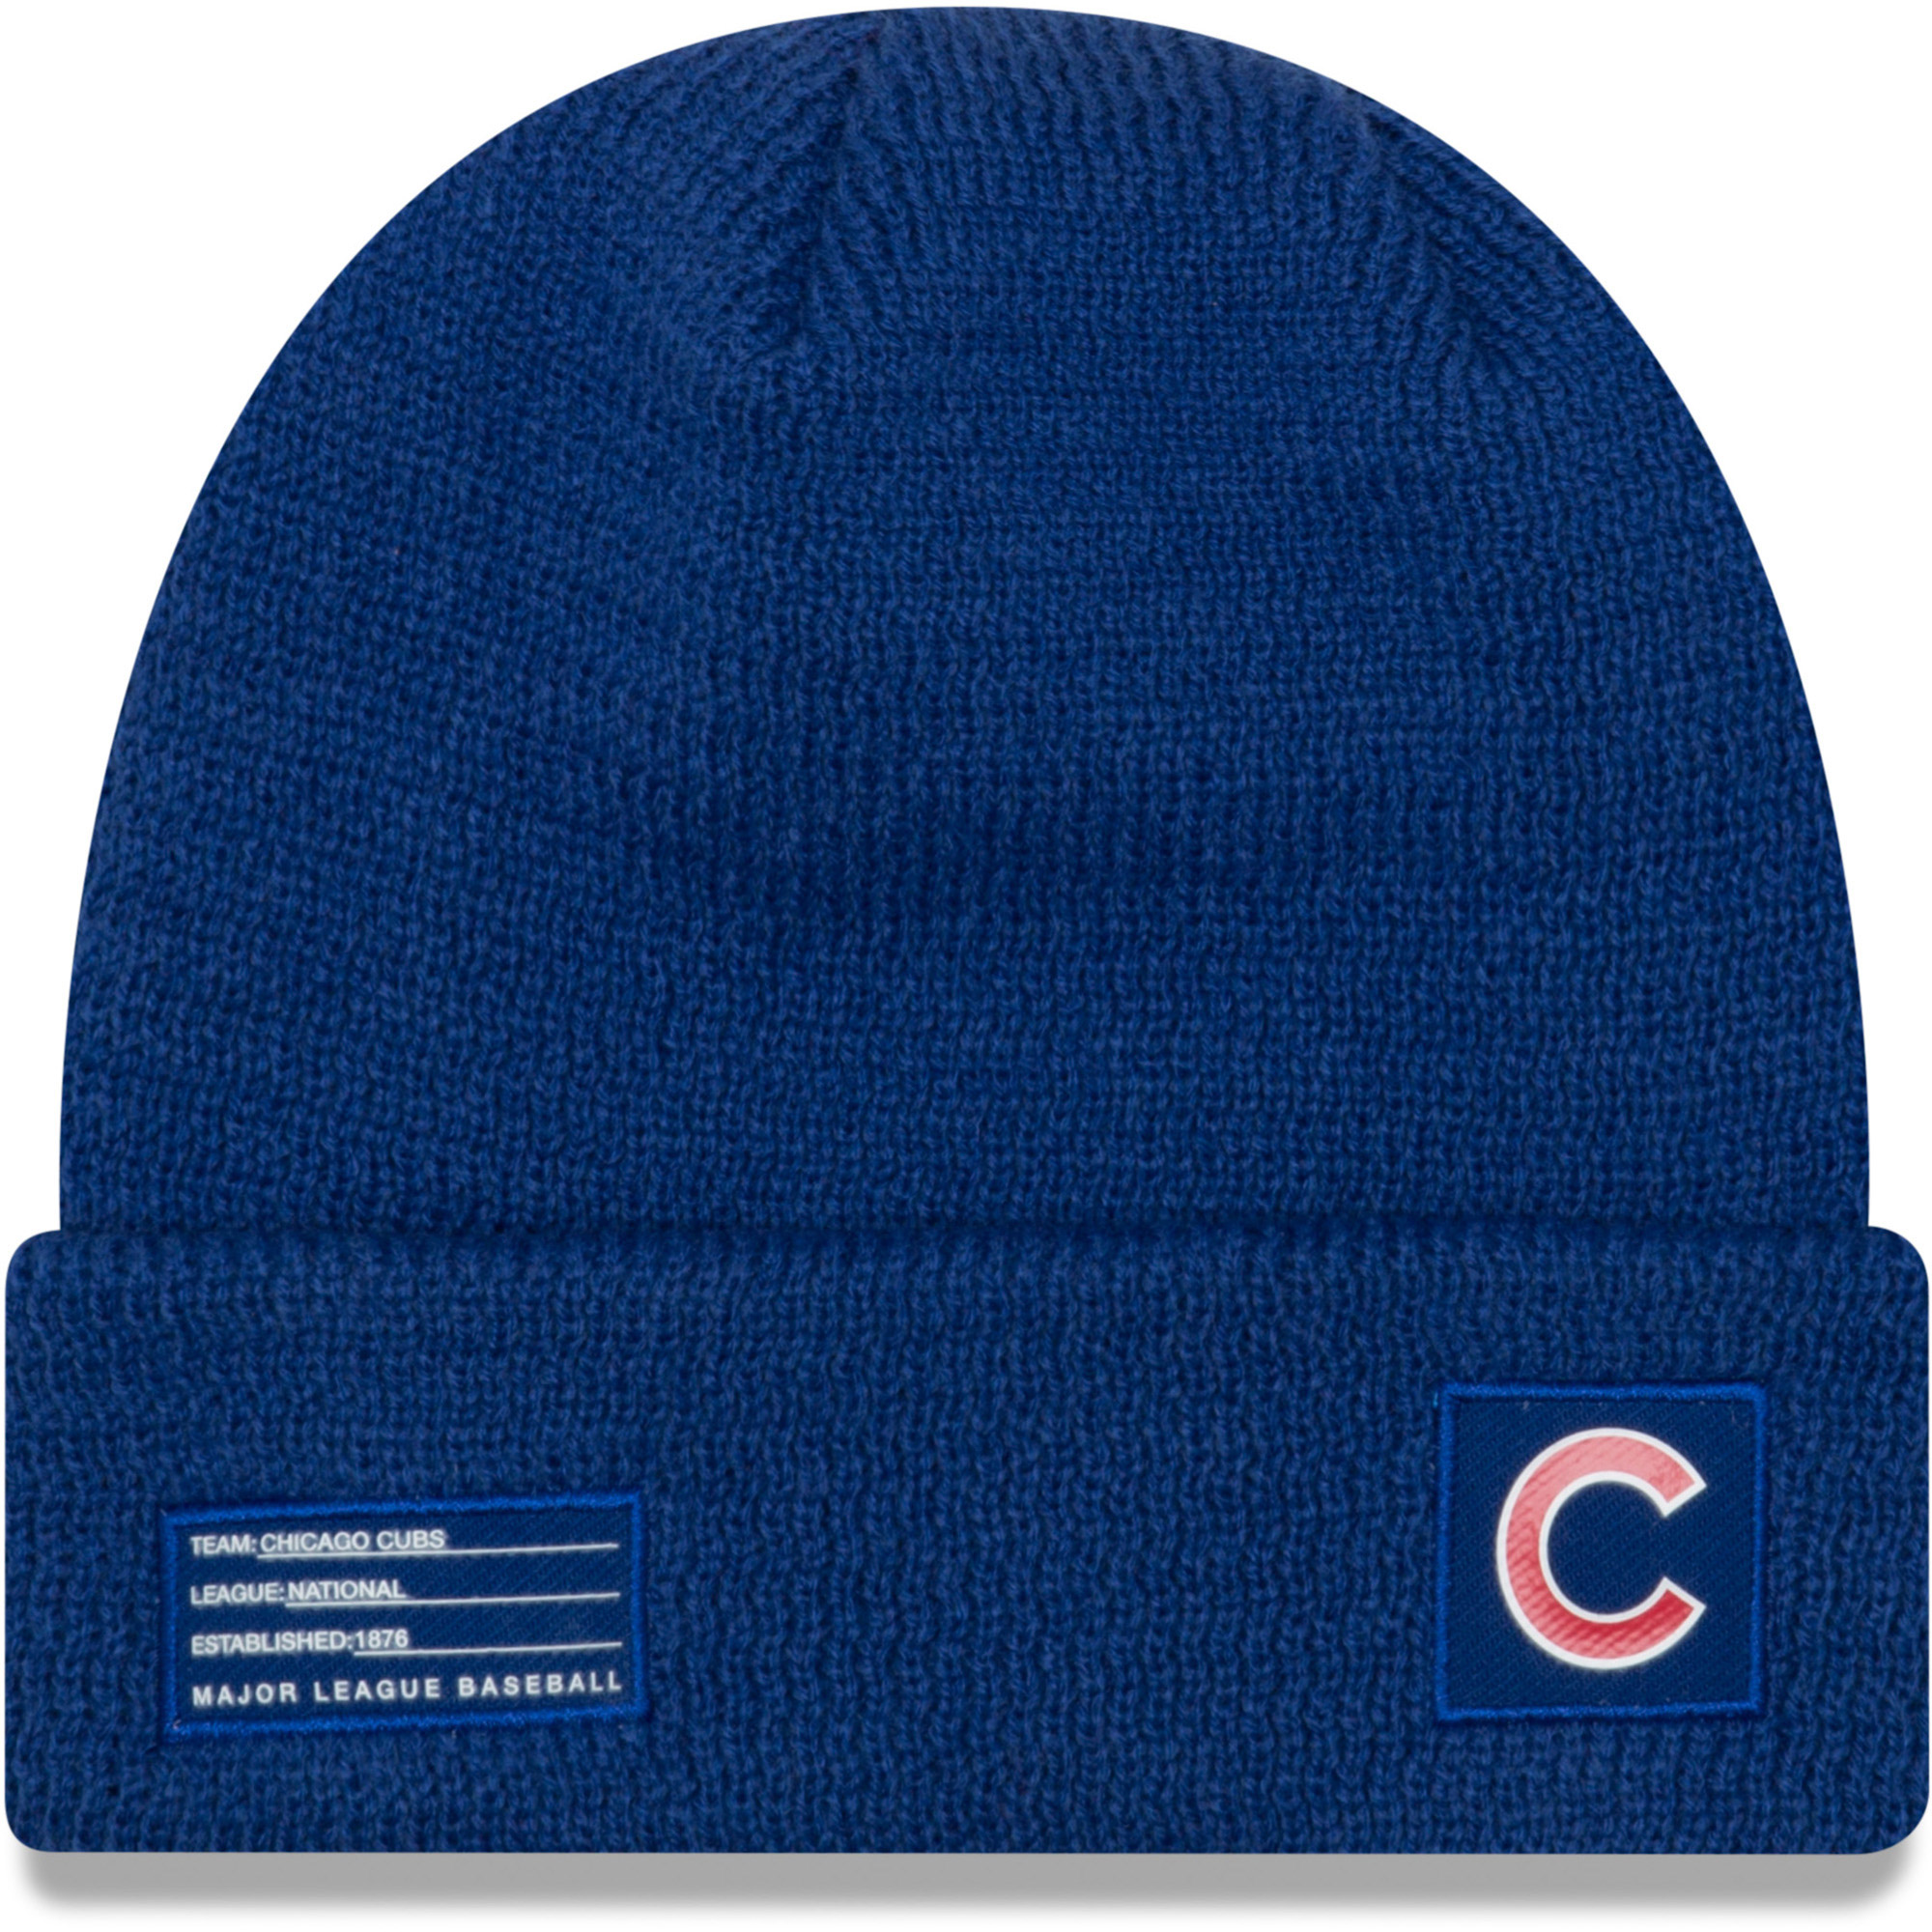 Chicago Cubs New Era On-Field Sport Cuffed Knit Hat - Royal - OSFA